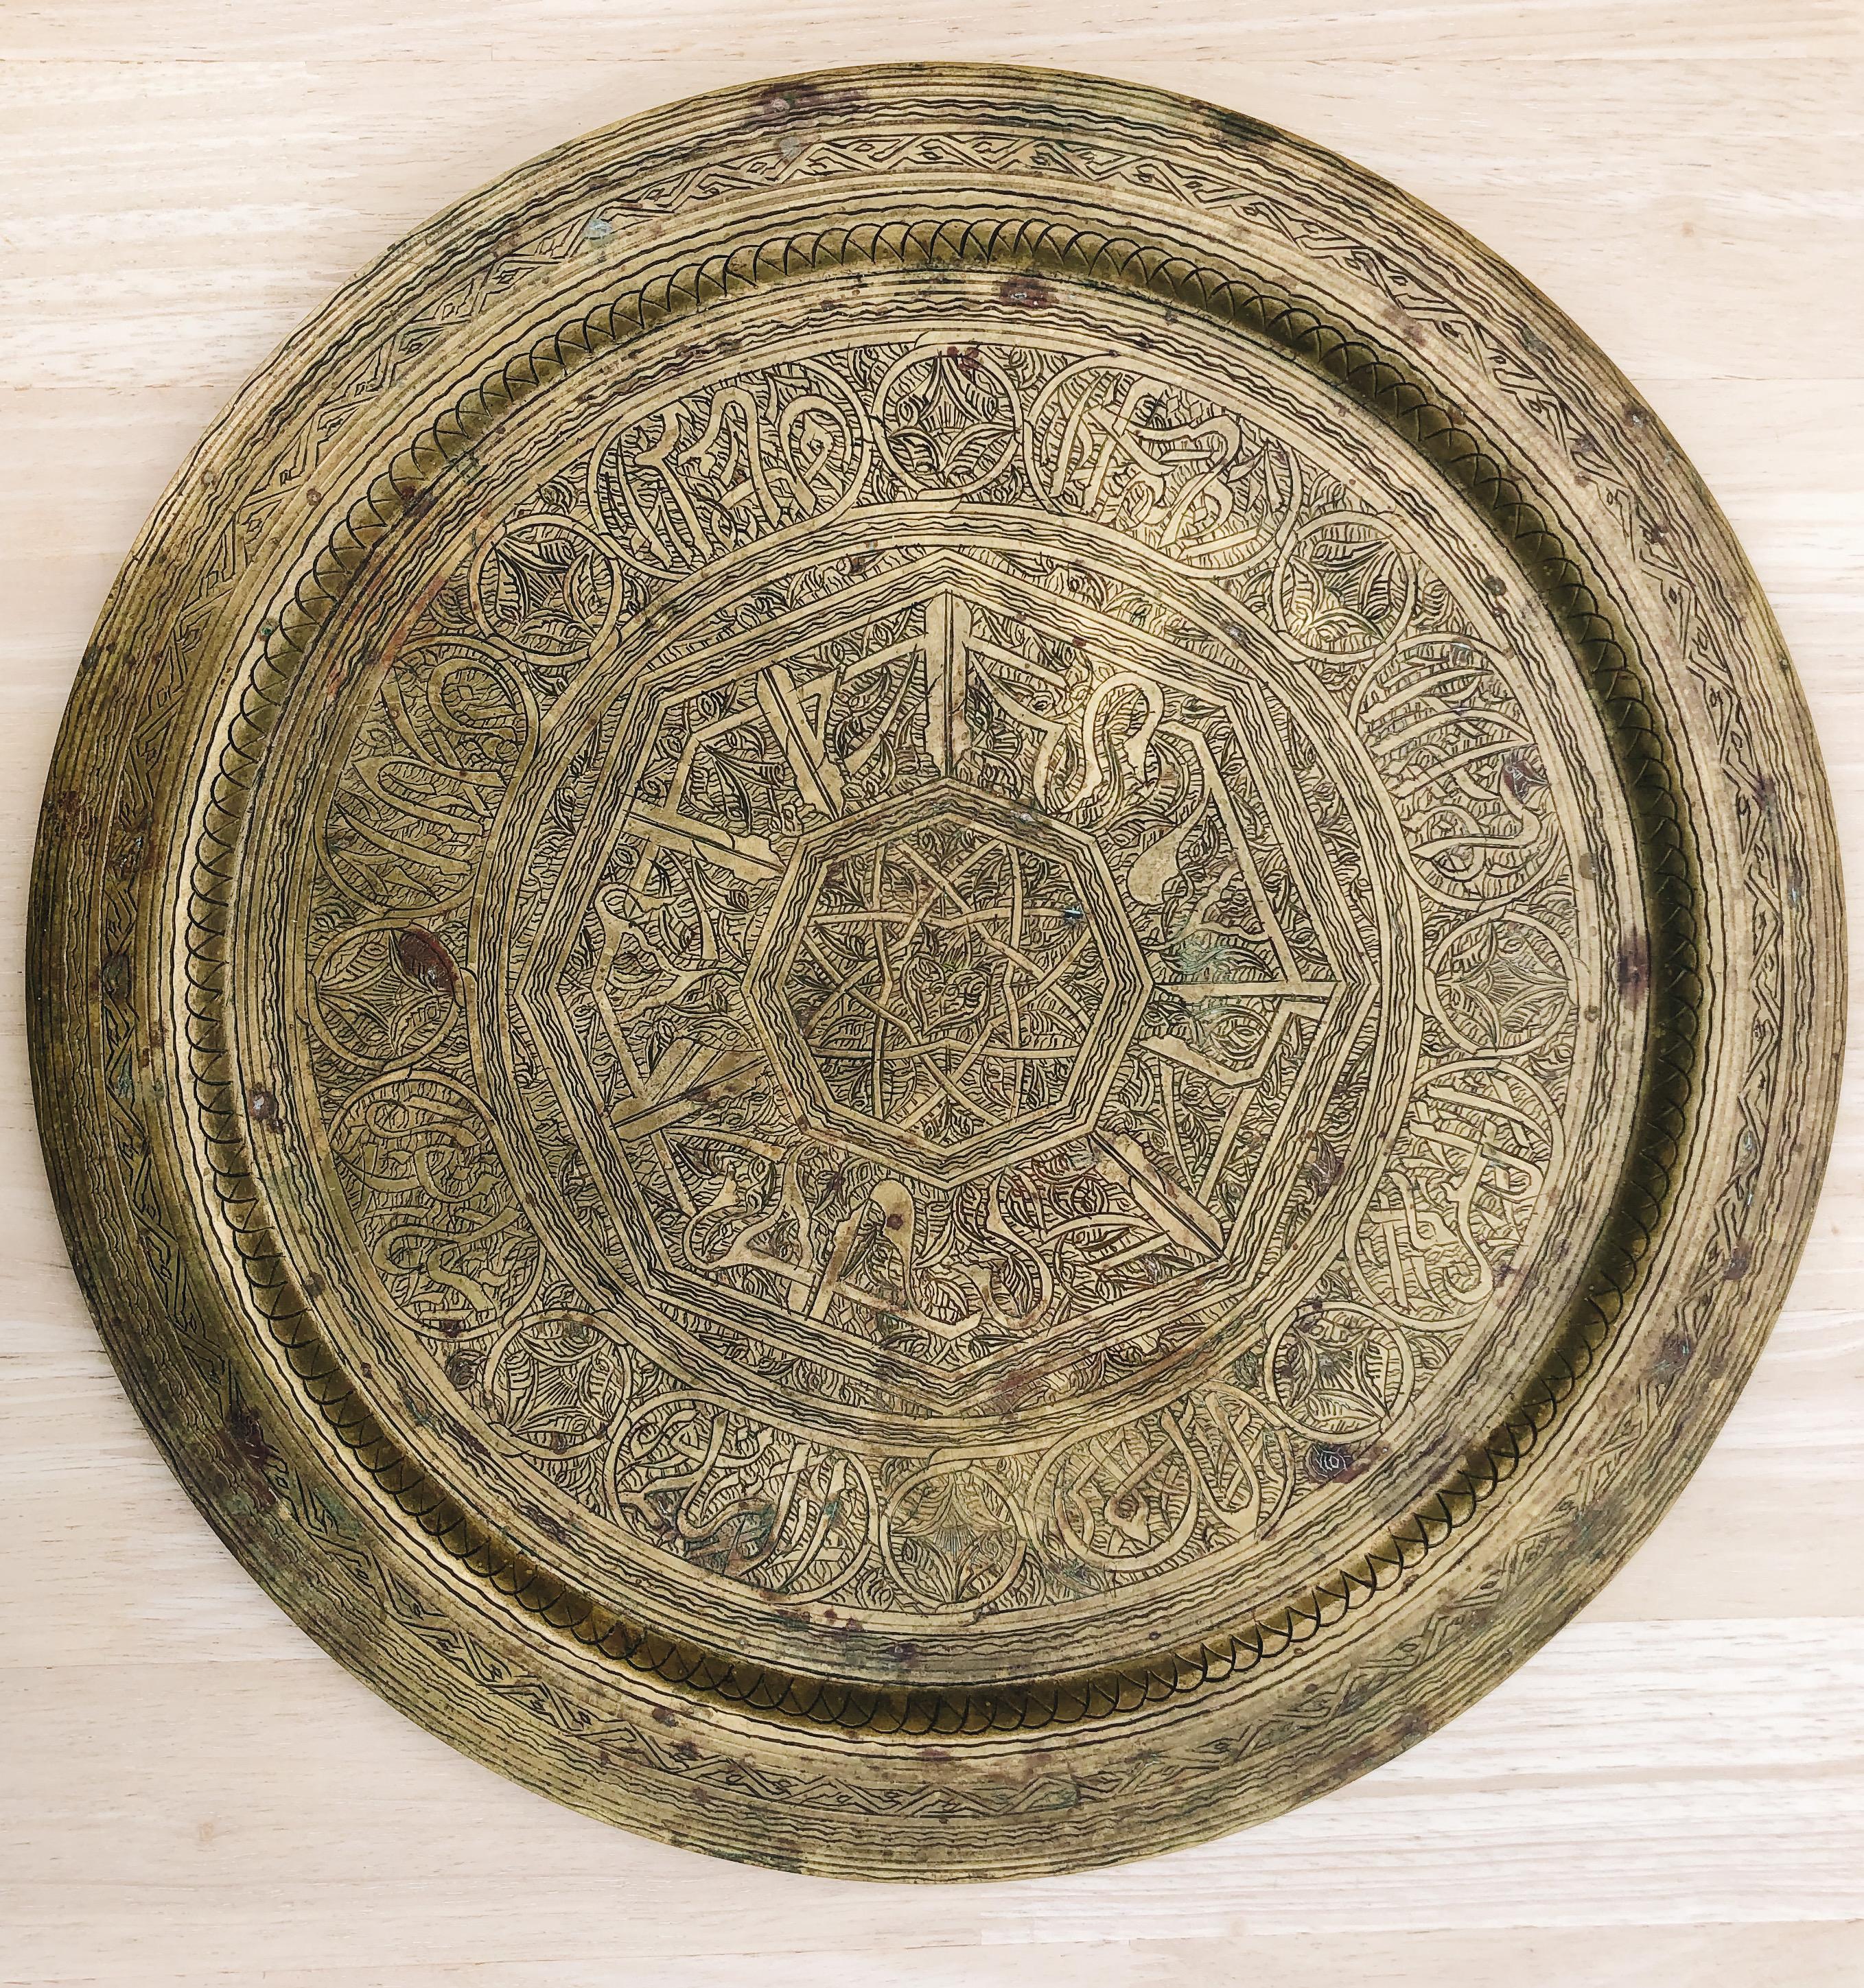 Ornate Gold/Brass Tray